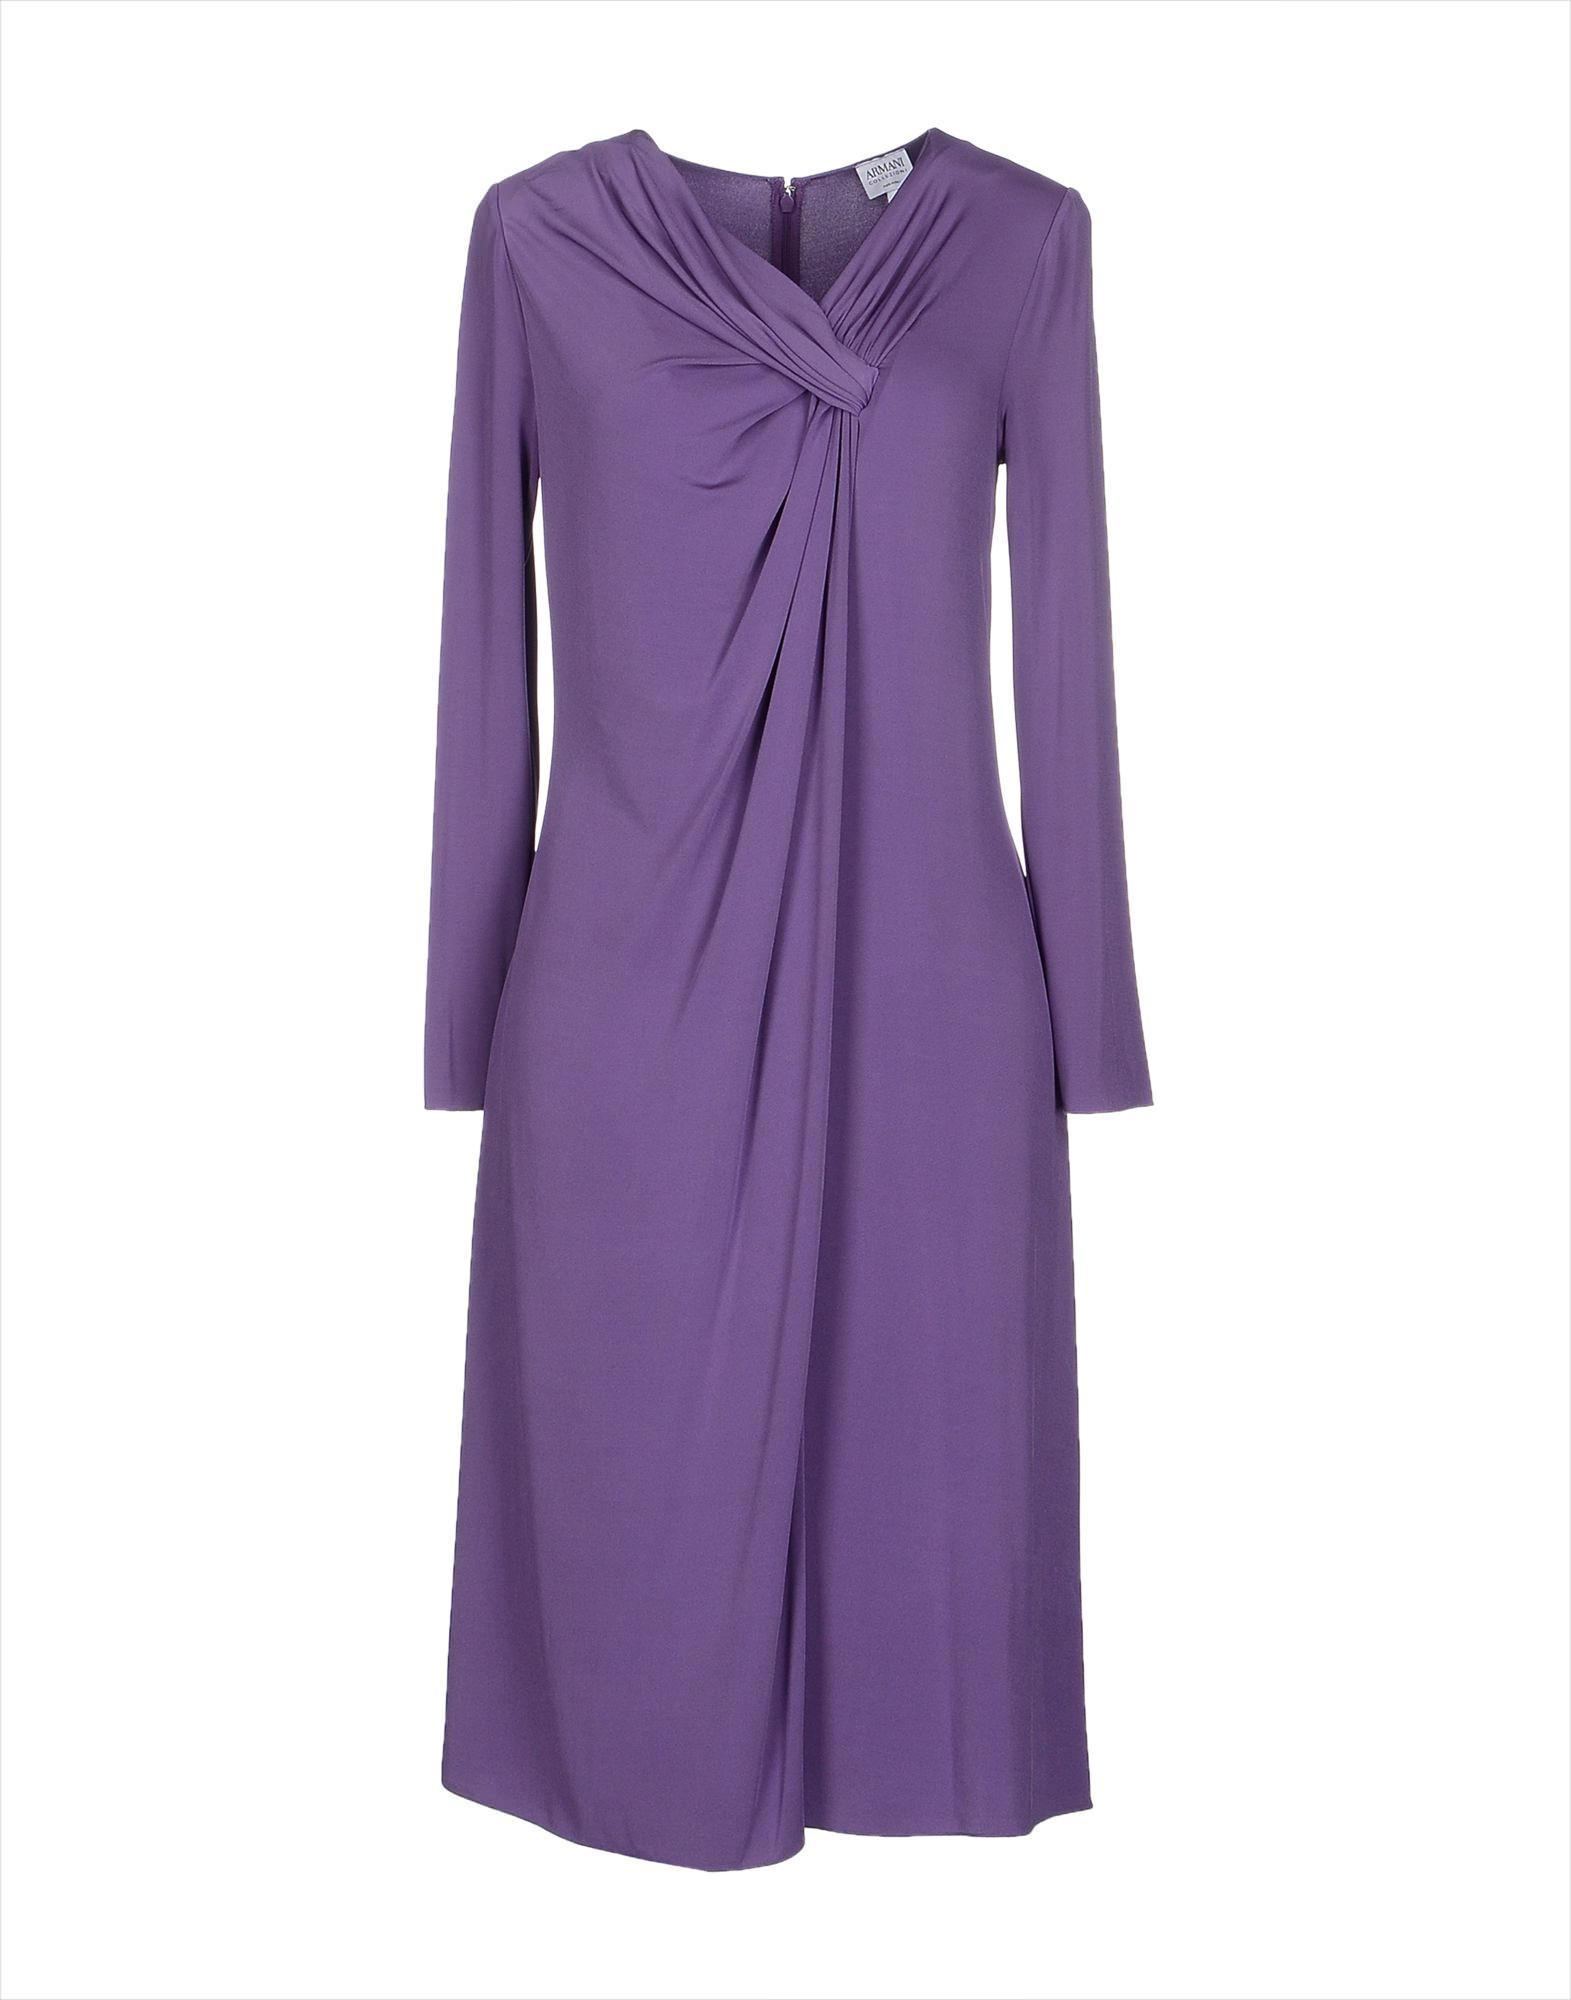 armani purple colored knee length dress